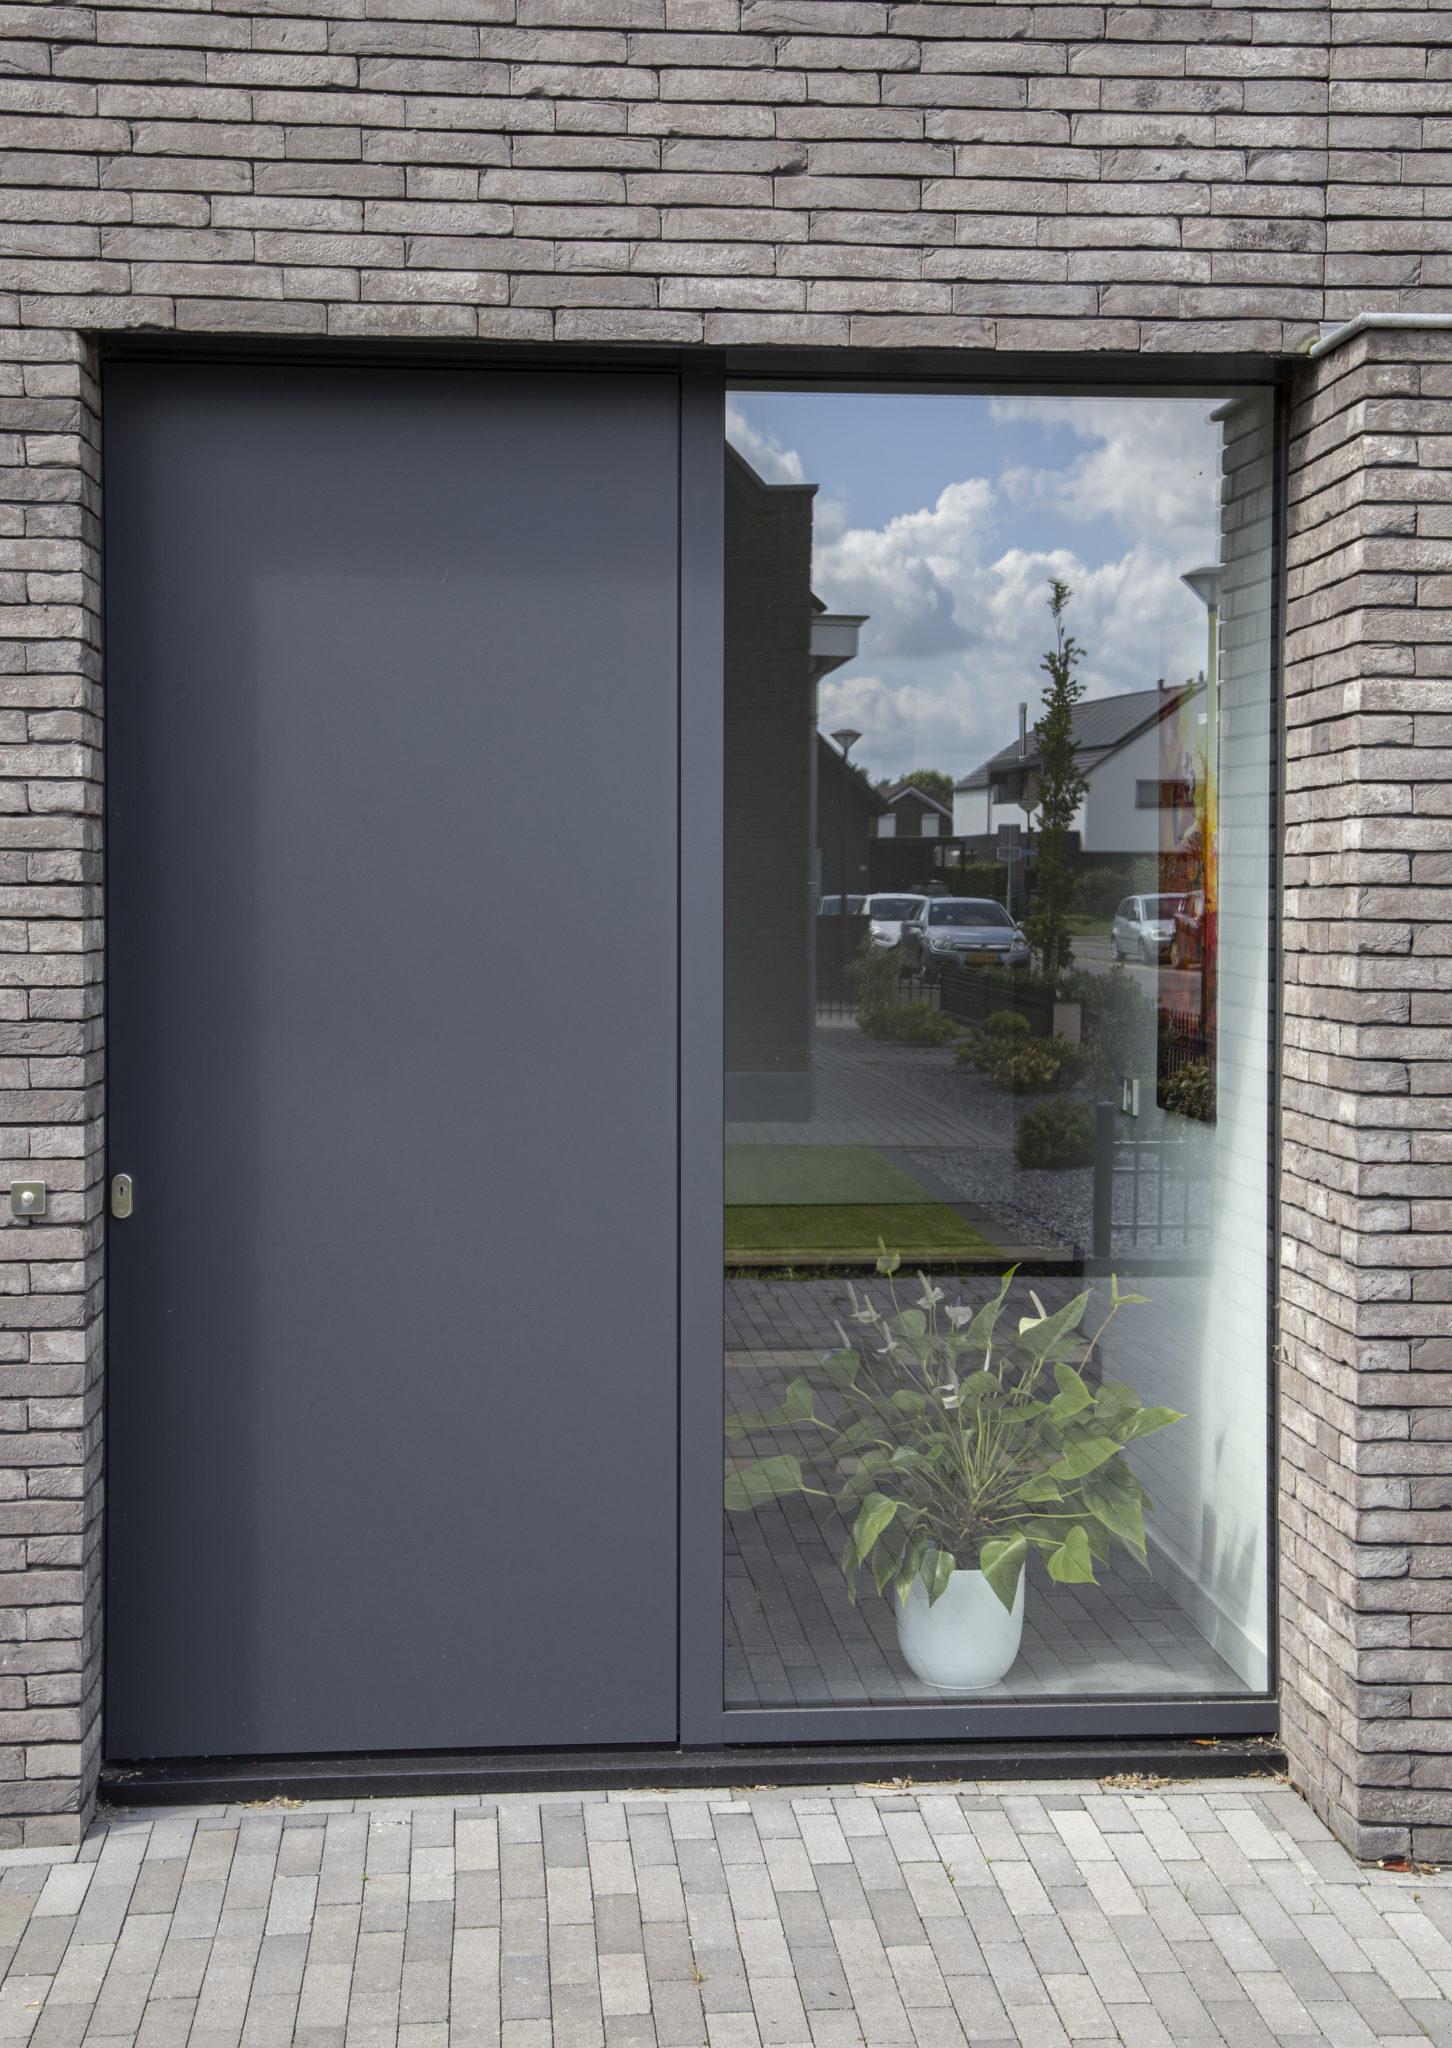 https://www.leonpeterskozijnen.nl/wp-content/uploads/2020/07/Leon15-scaled.jpg